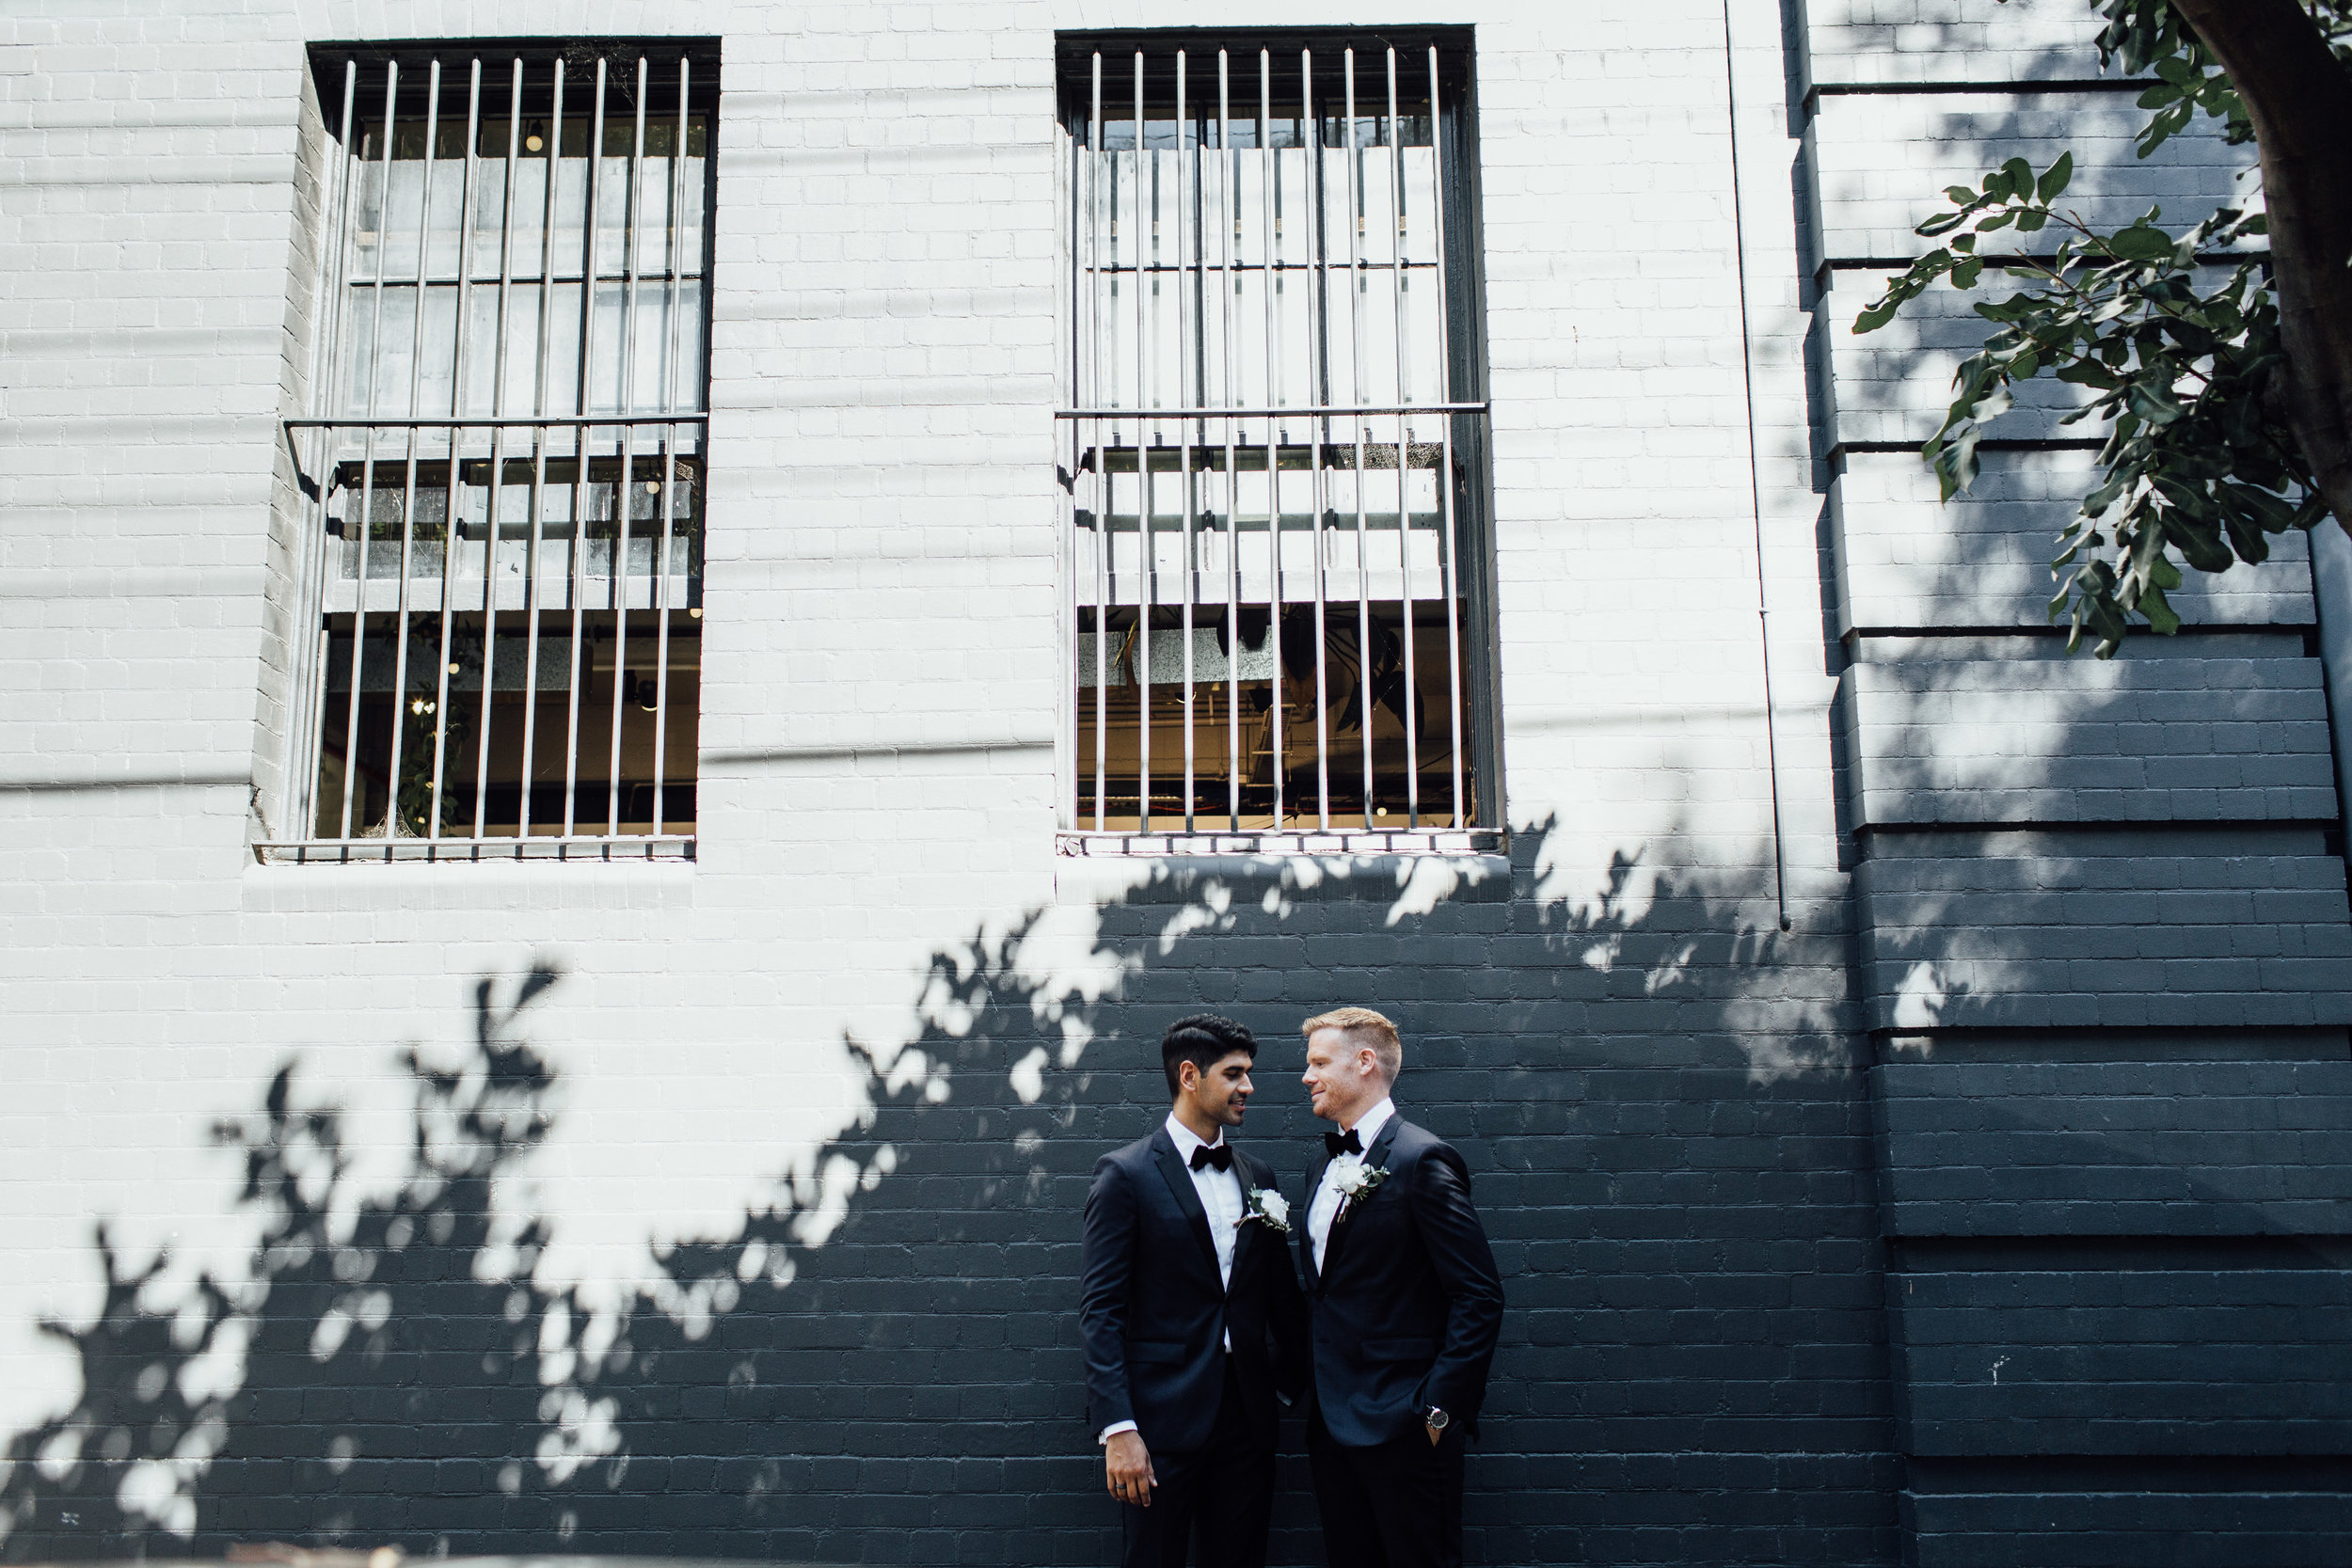 Stephen&David-Wedding-261.jpg